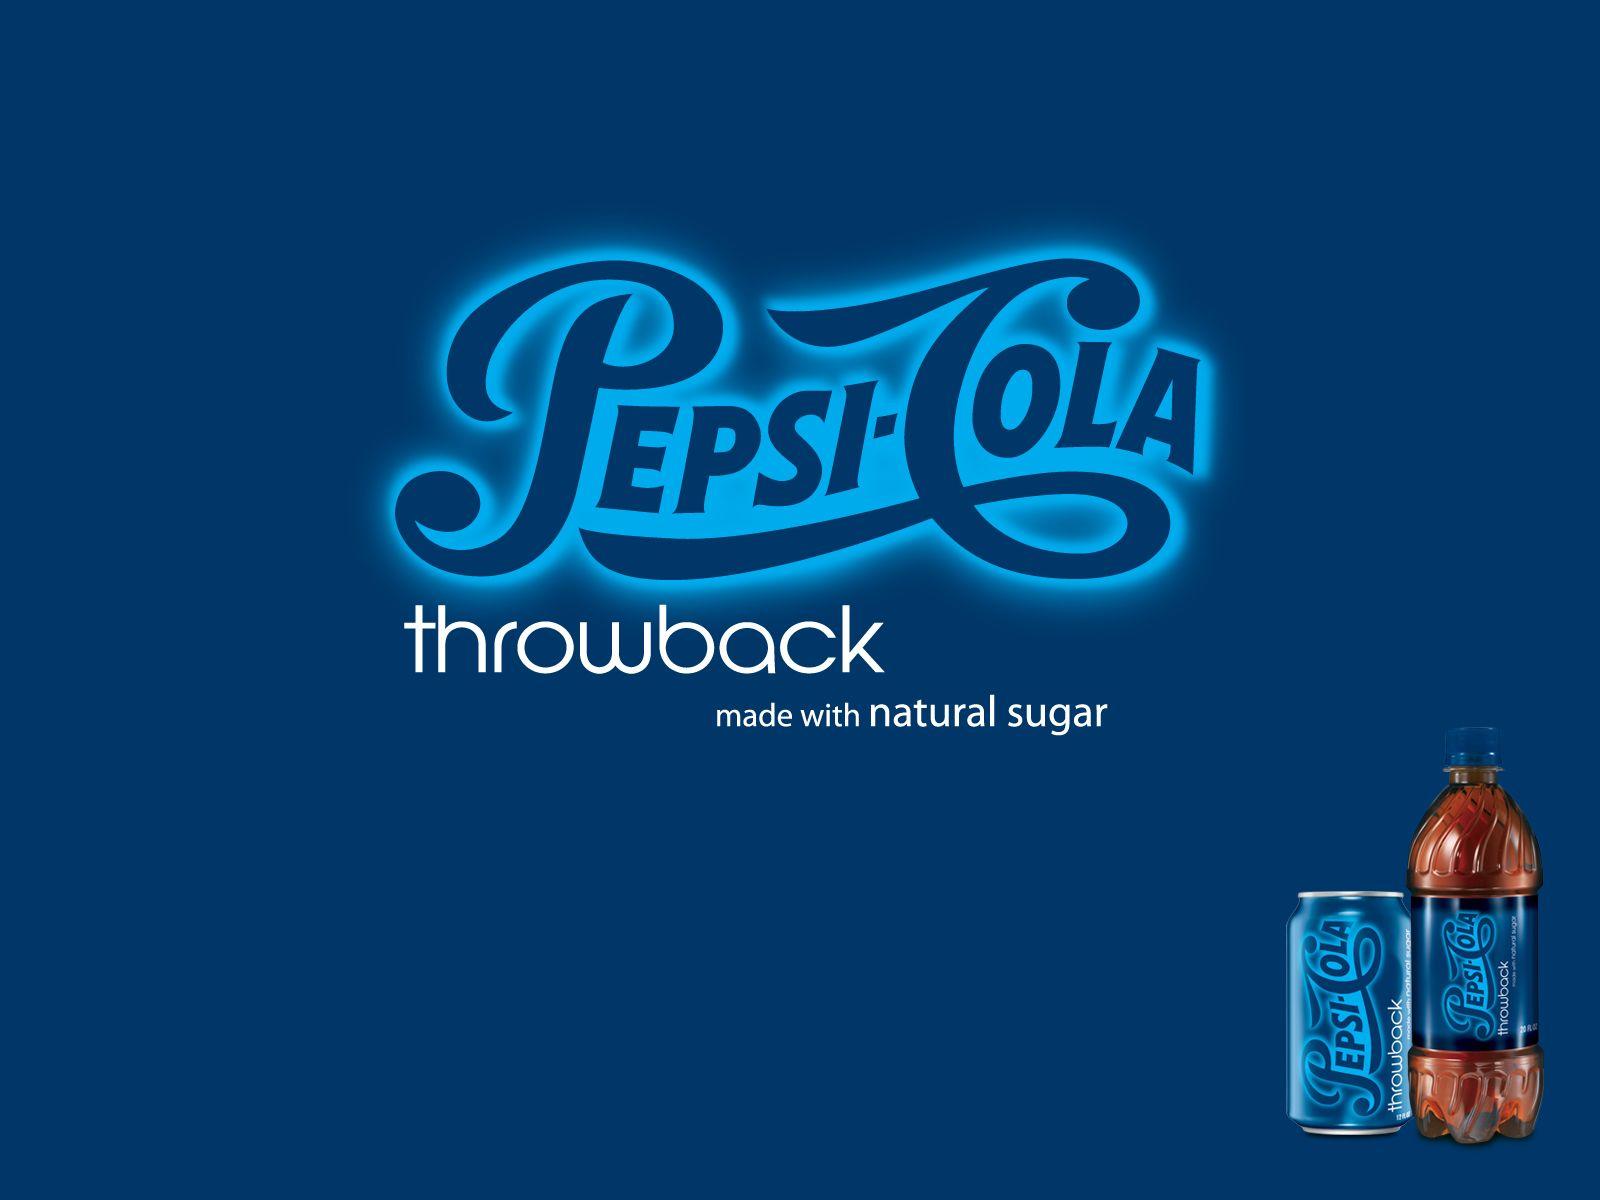 Pepsi Cola Wallpapers 1600x1200